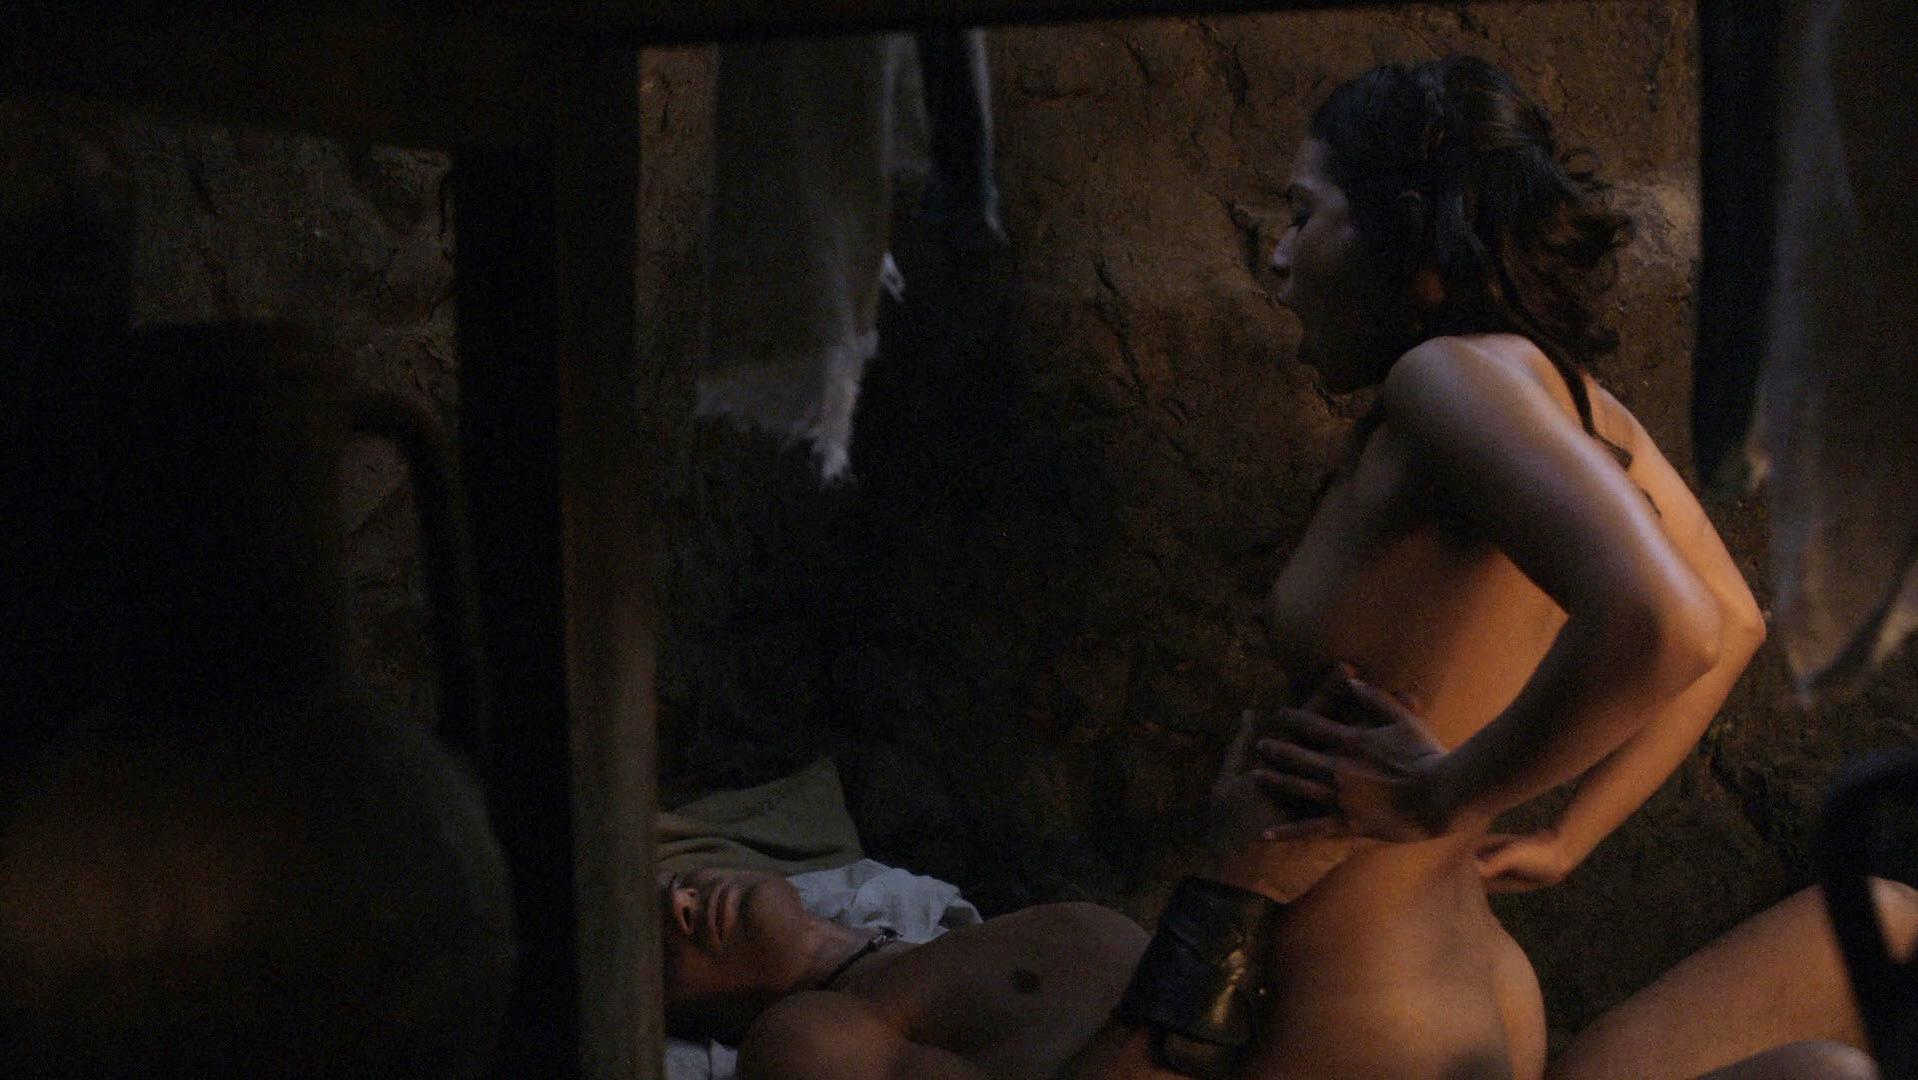 Horny woman lesley ann brandt nude need